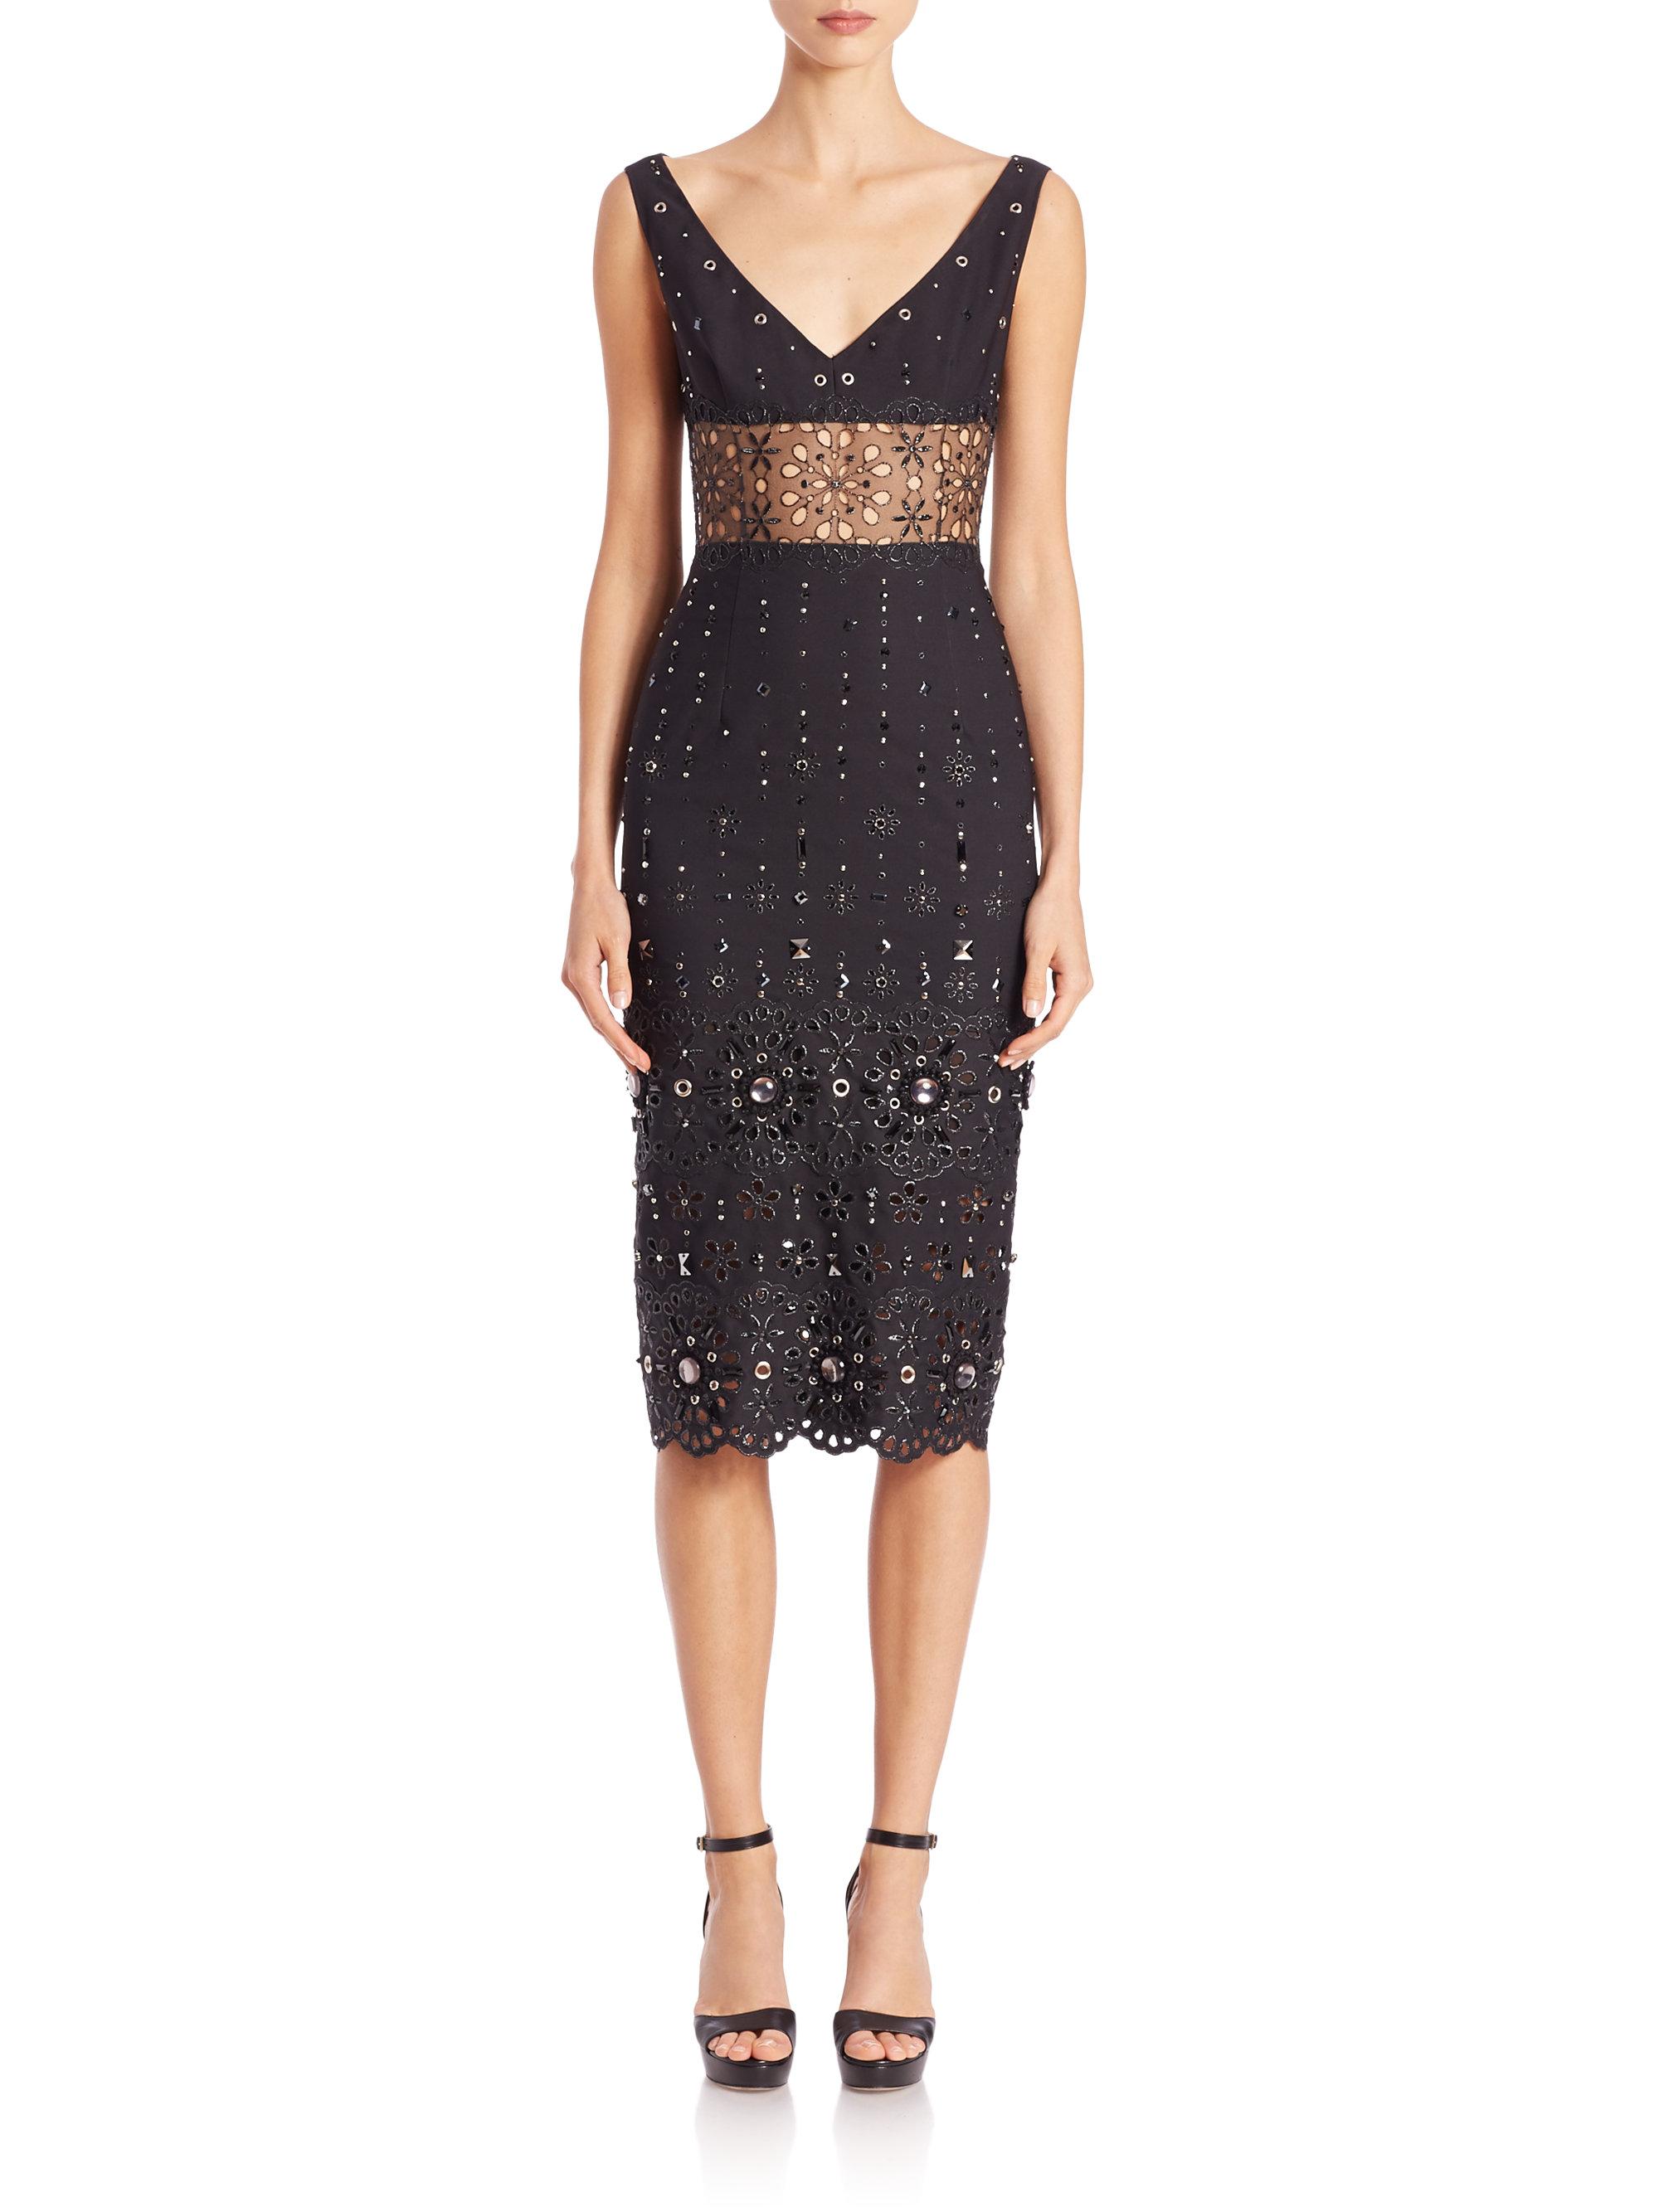 Lyst Marc Jacobs Embellished Organza Sheath Dress In Black